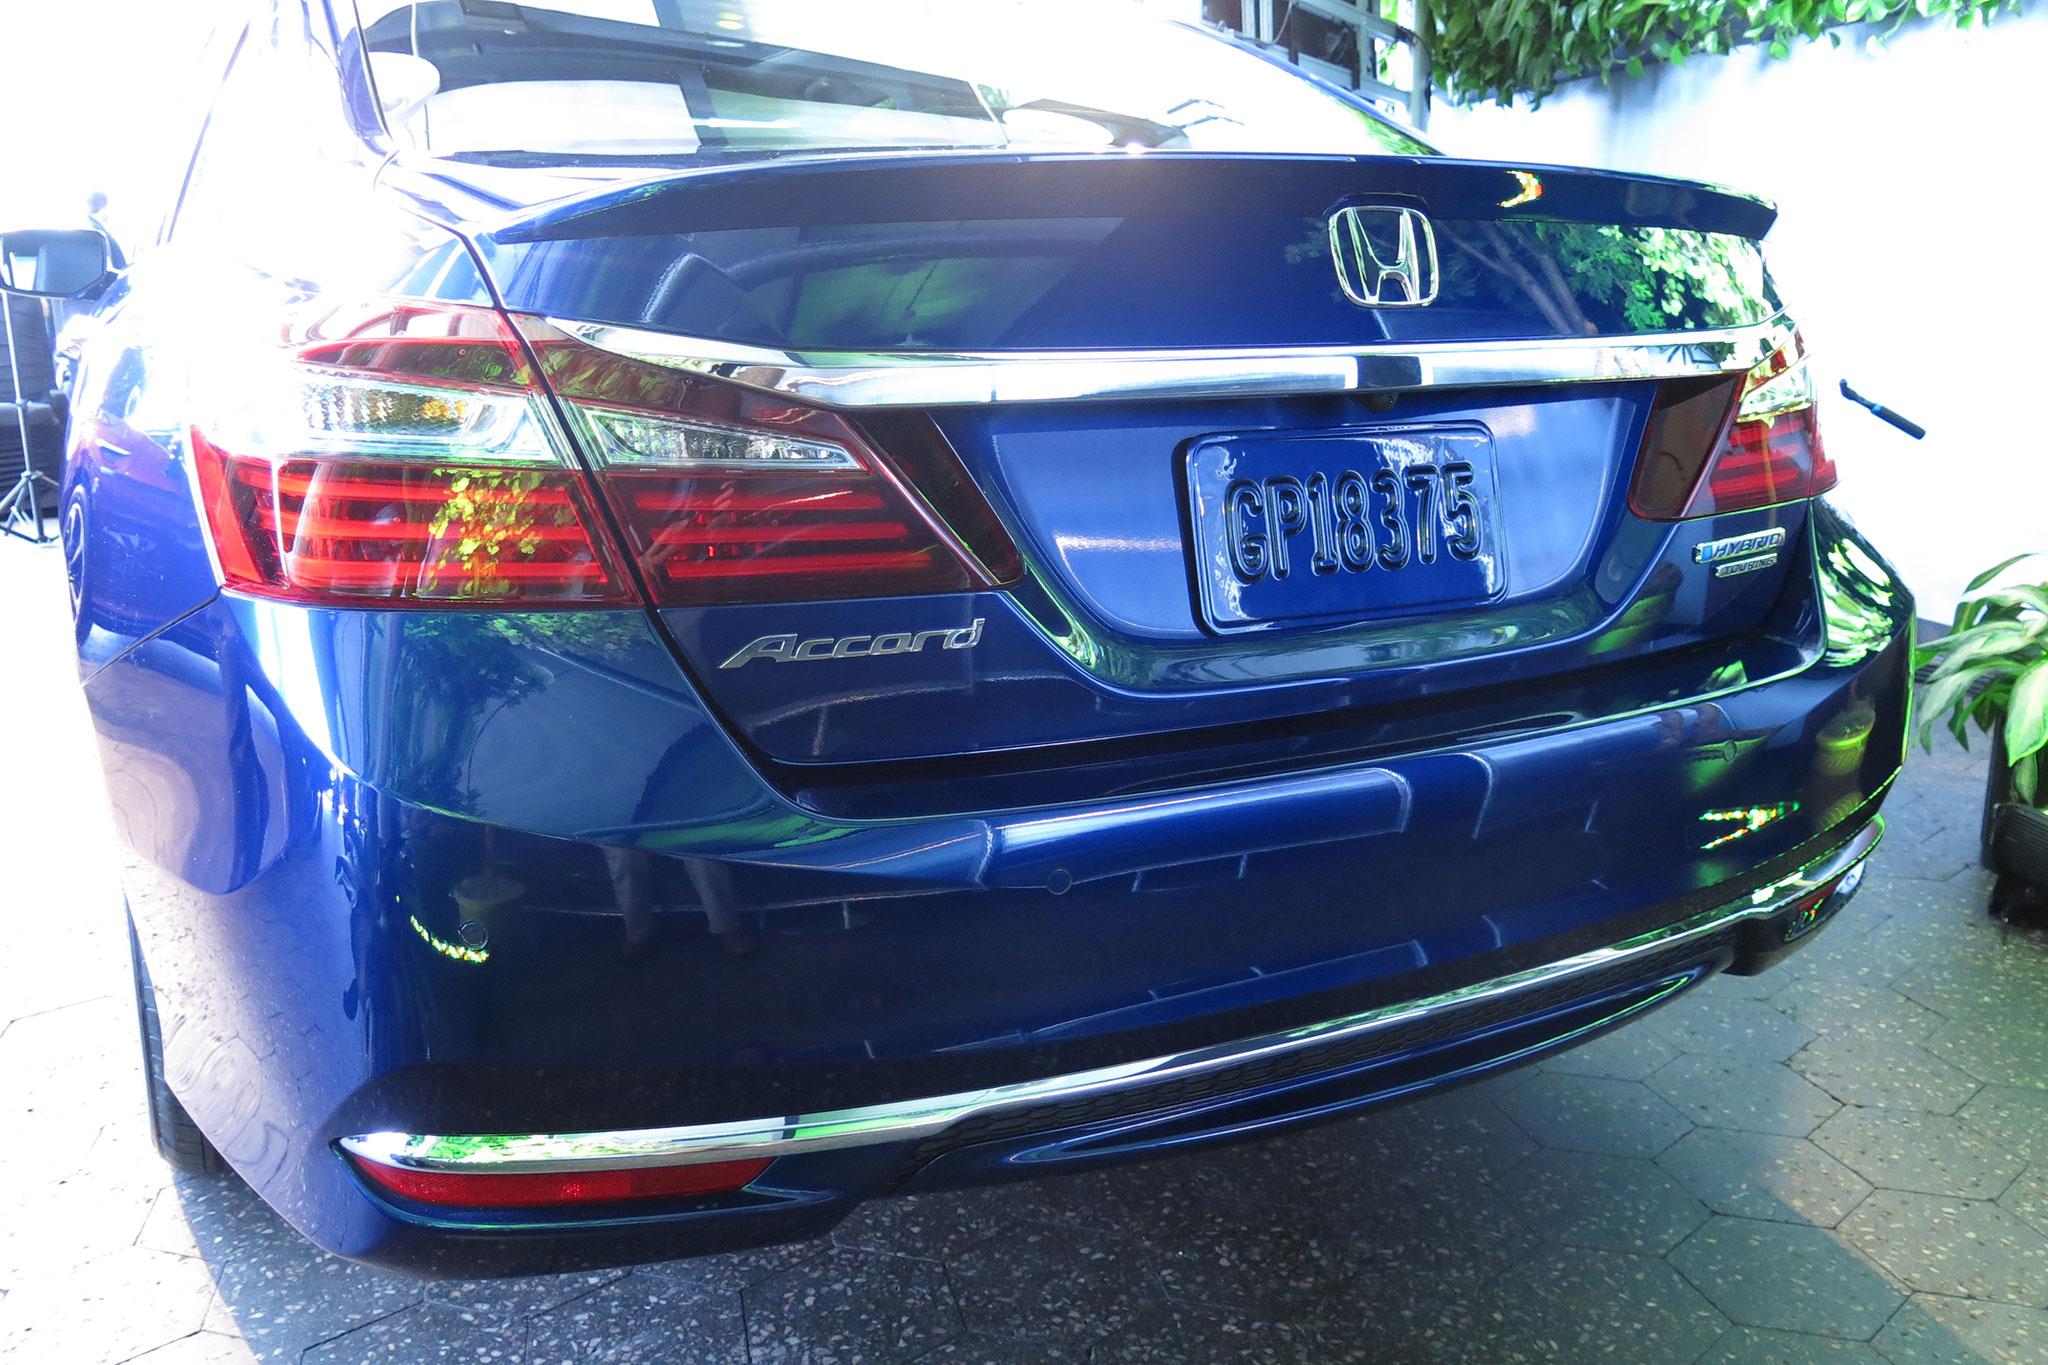 2014 Honda Accord Sport For Sale >> 2017 Honda Accord Hybrid Gets More Power, Improved Efficiency | Automobile Magazine